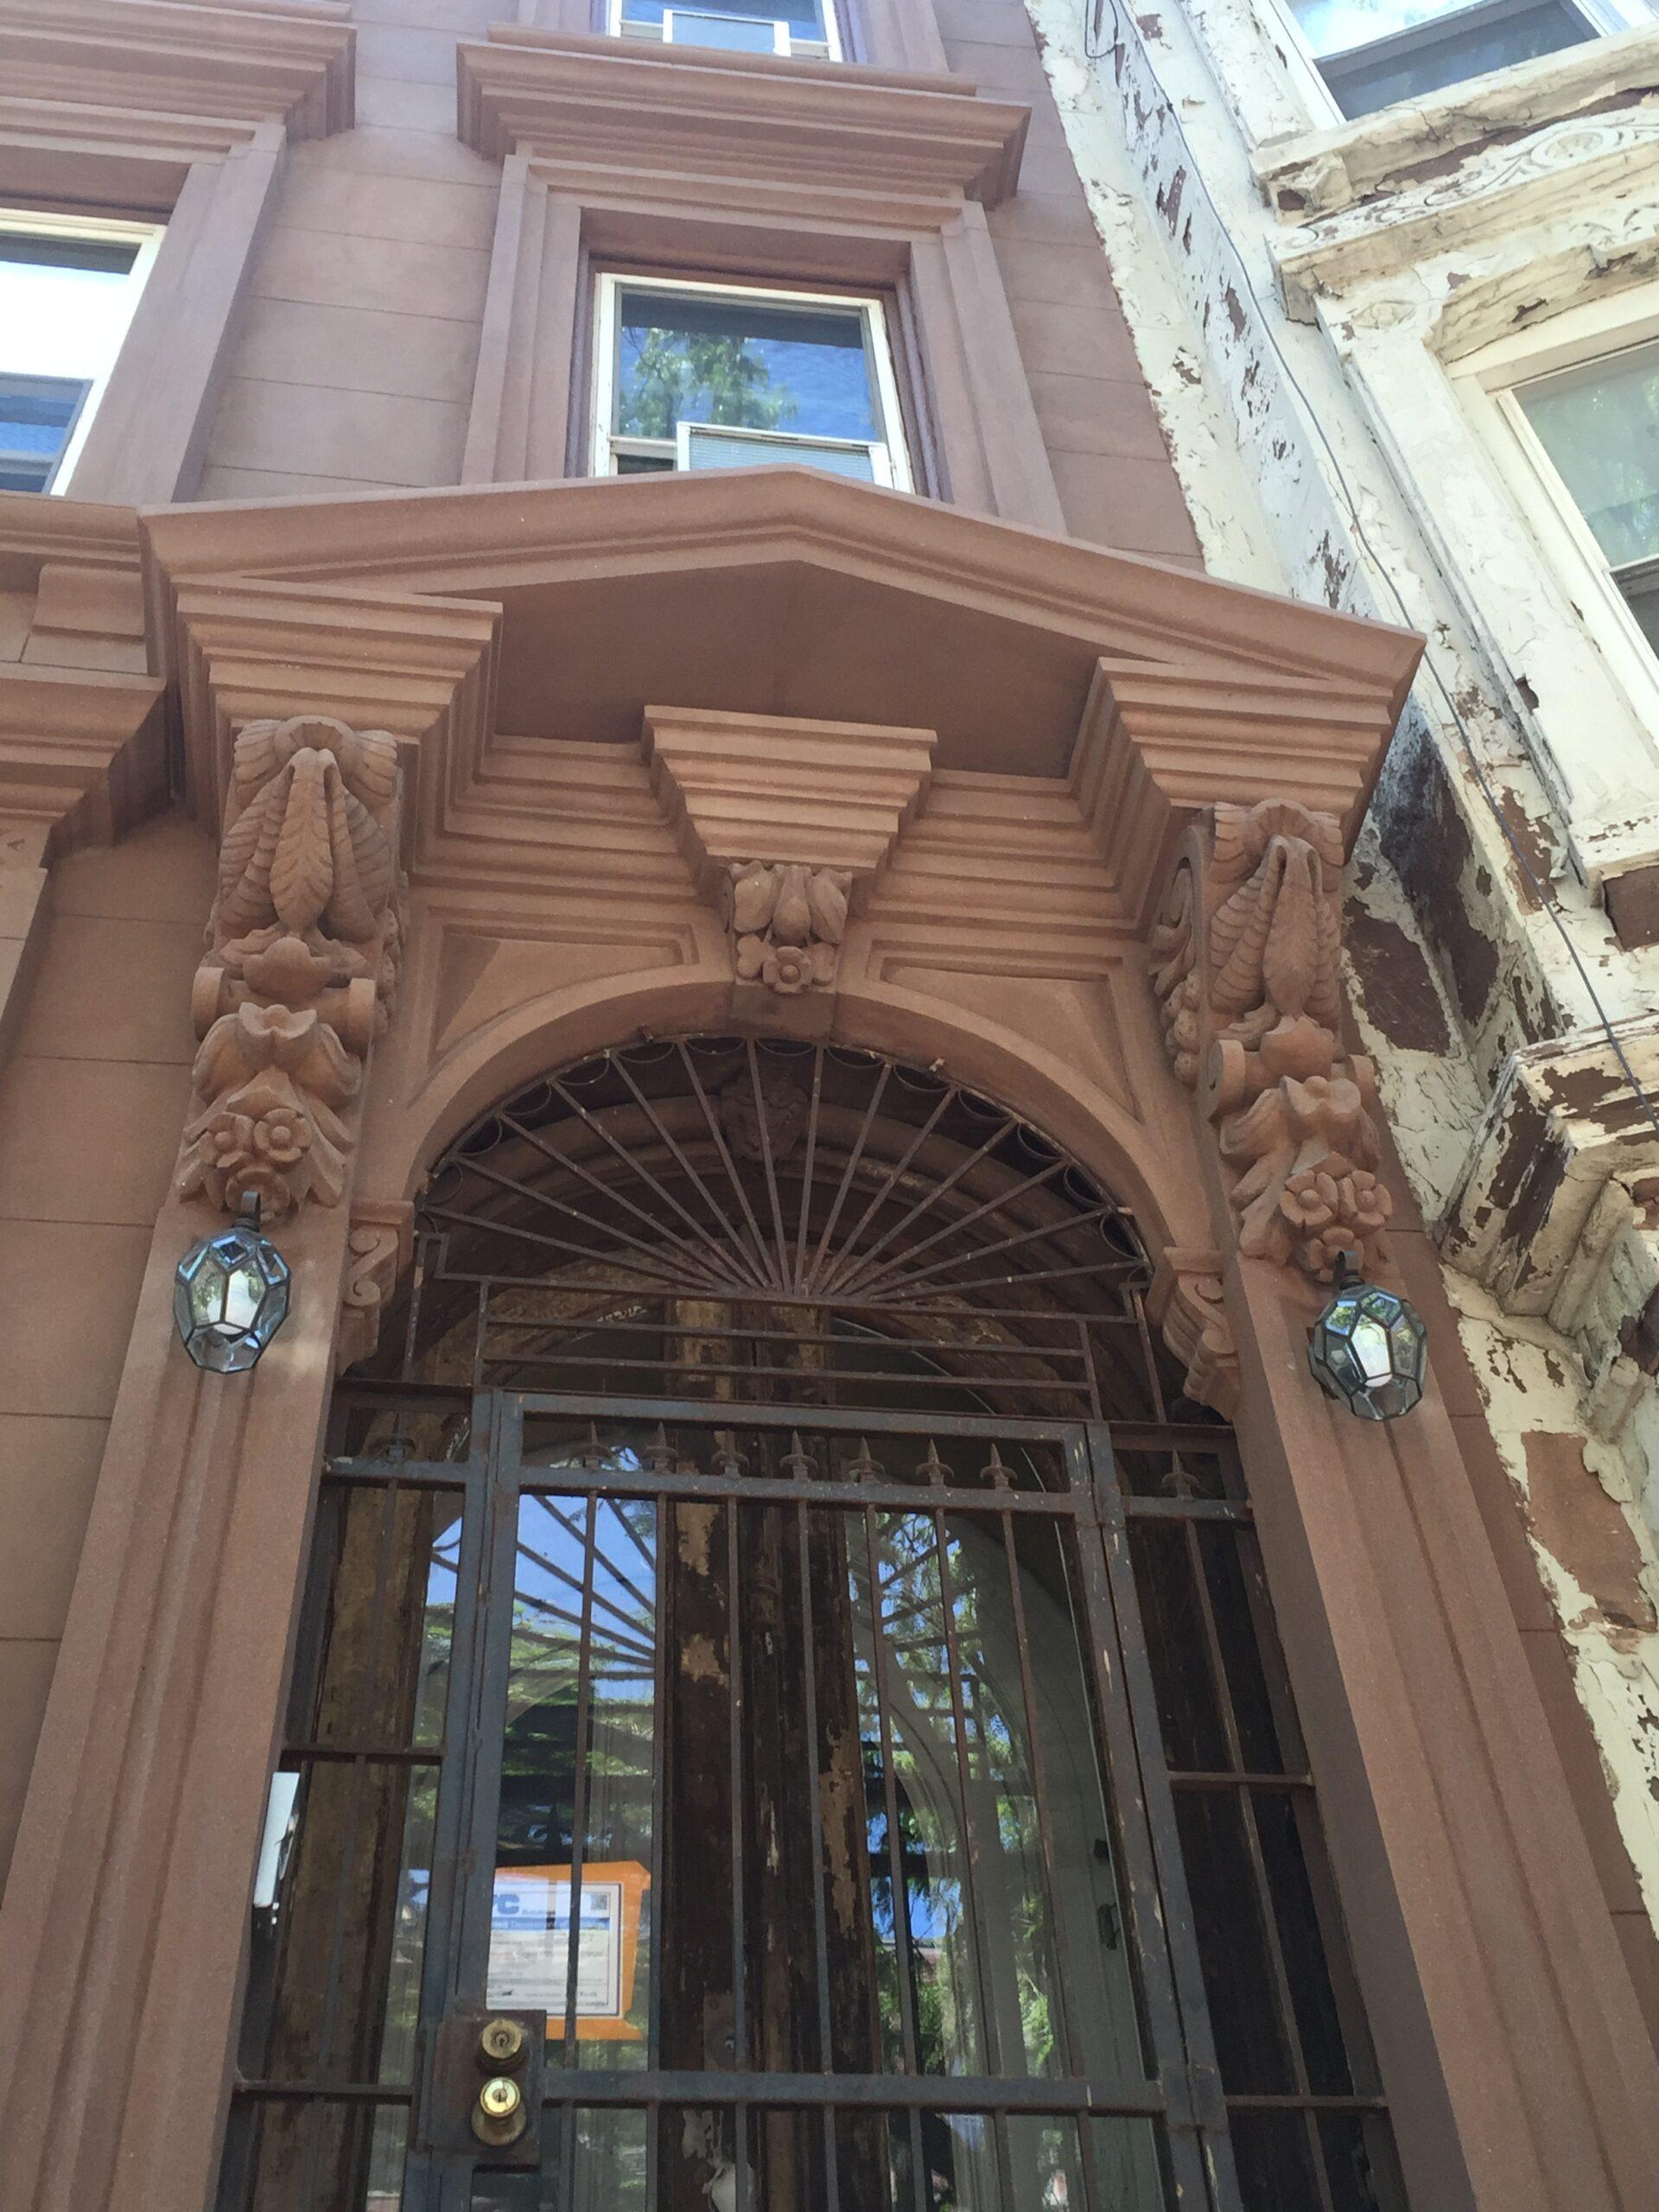 572 Washington Ave- Clinton Hill Brooklyn- Brownstone Facade Restoration